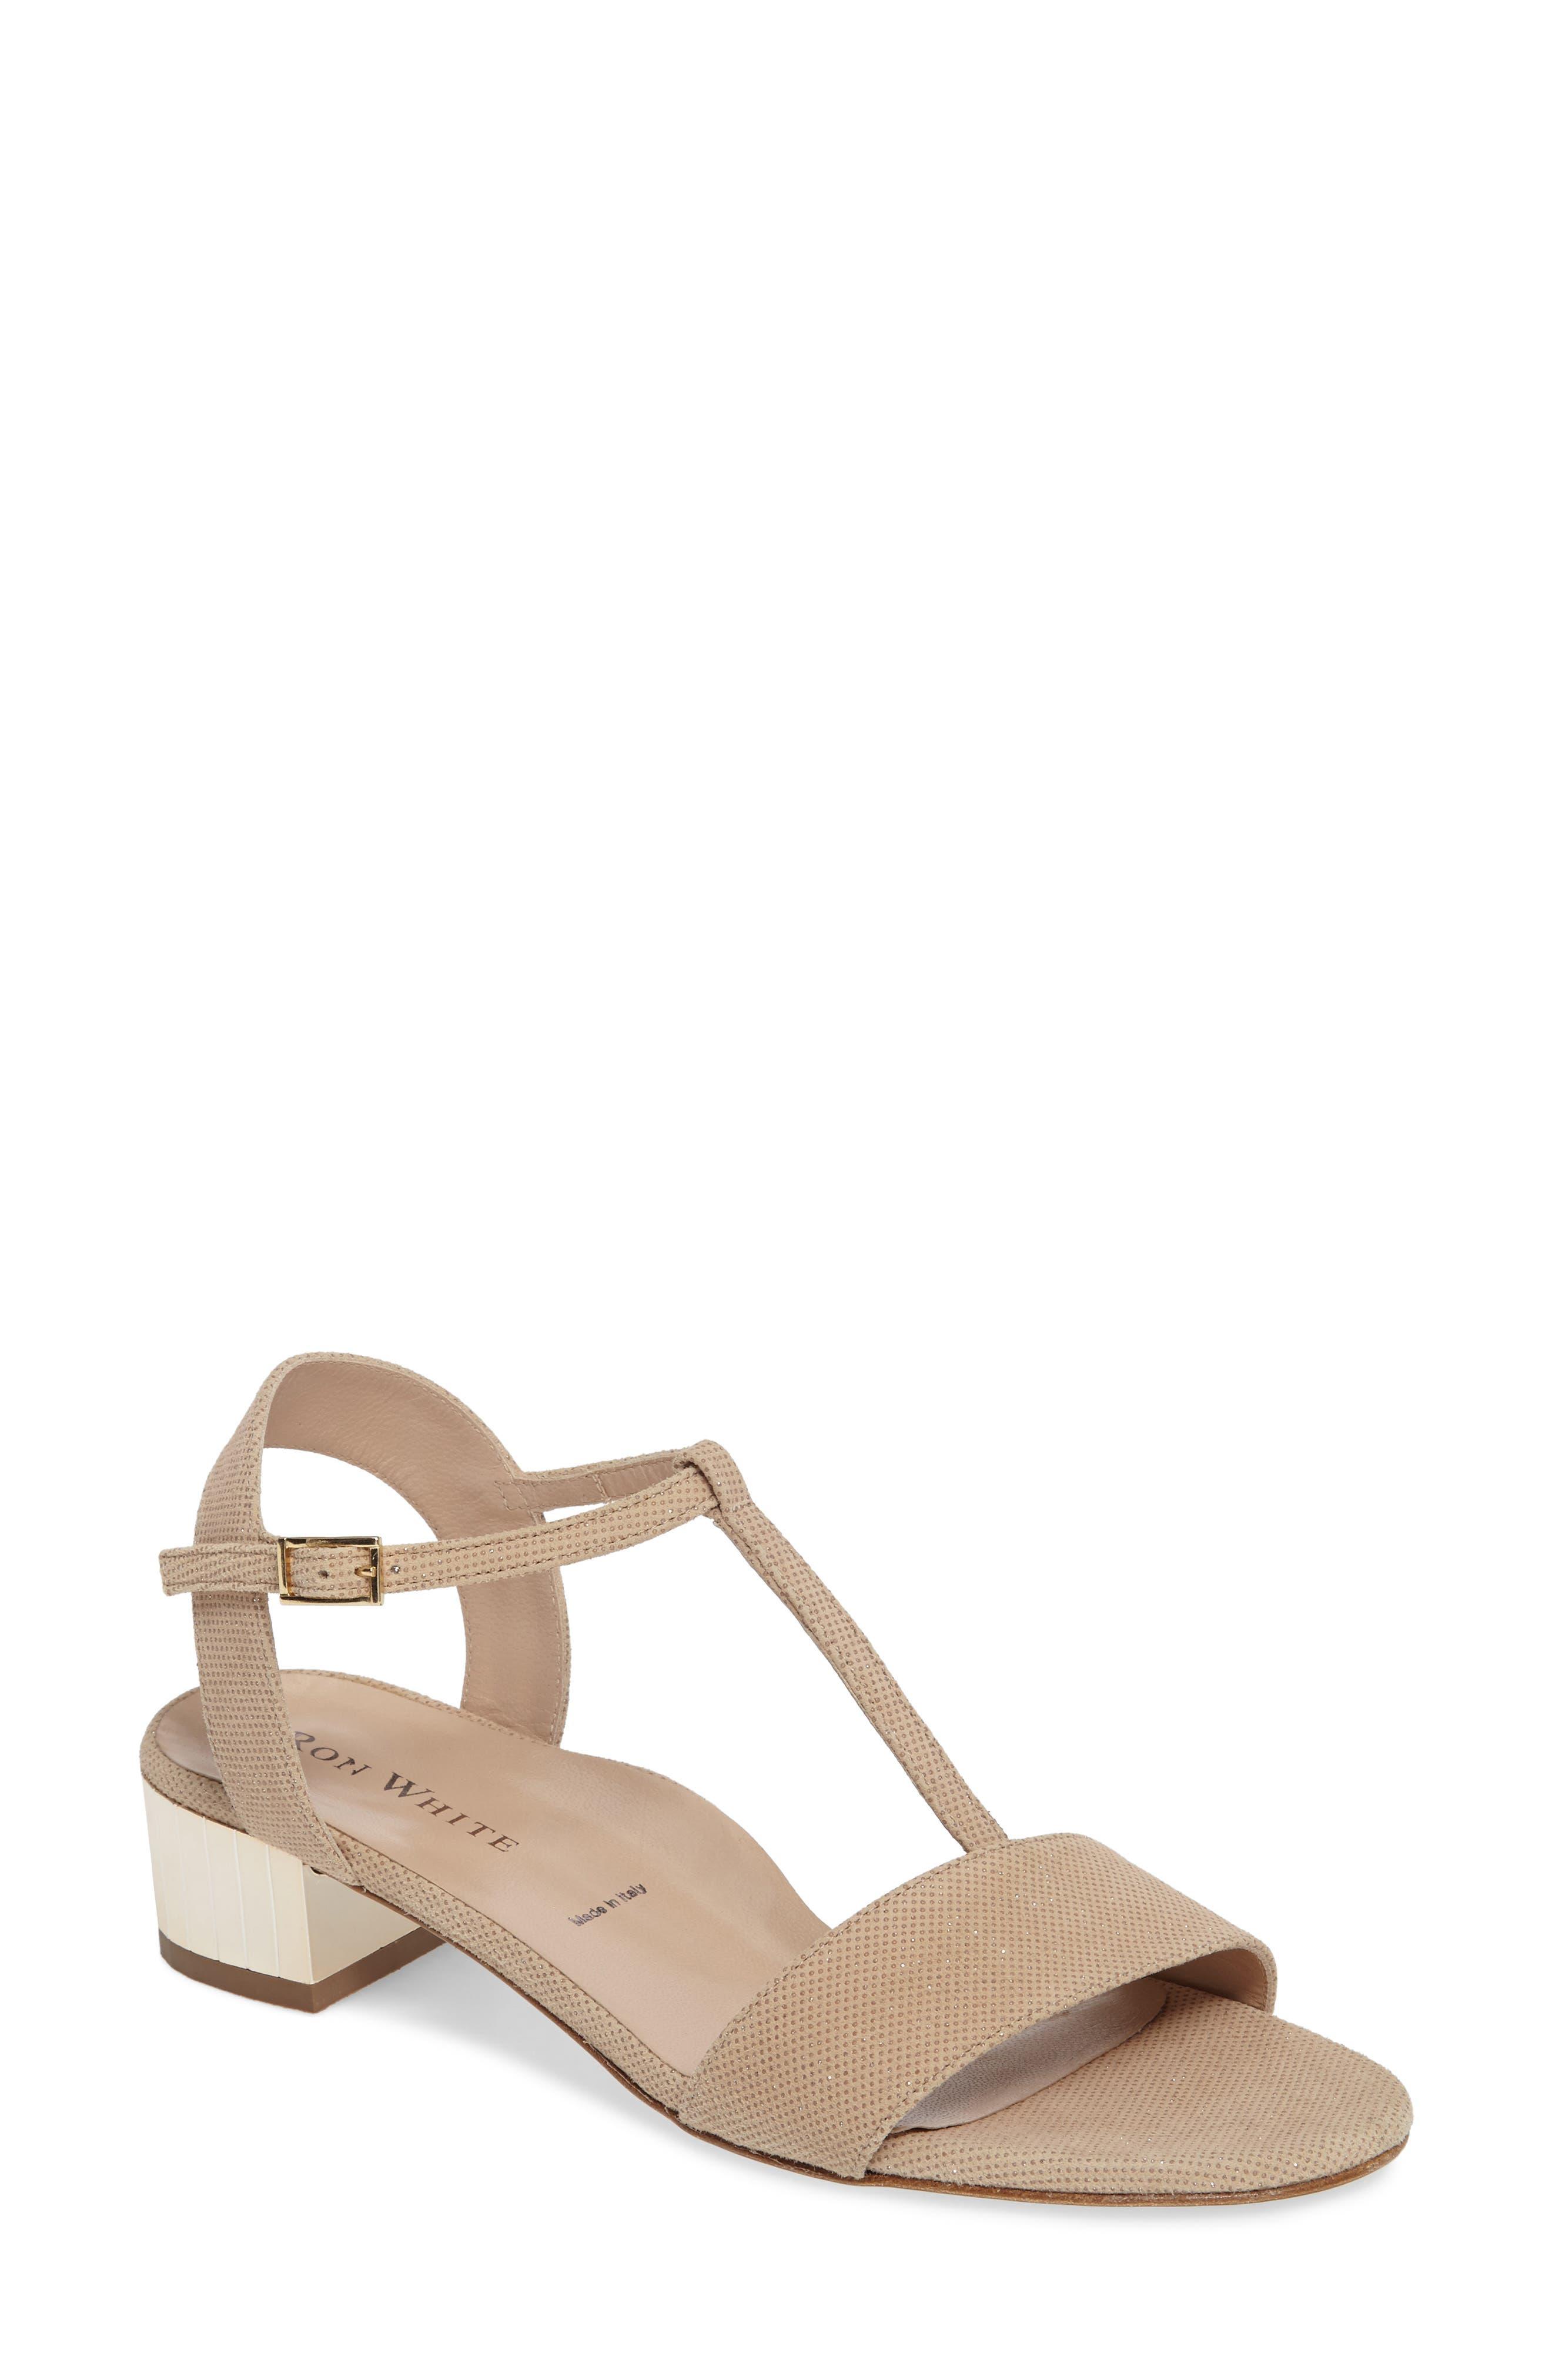 Alternate Image 1 Selected - Ron White Esme T-Strap Sandal (Women)